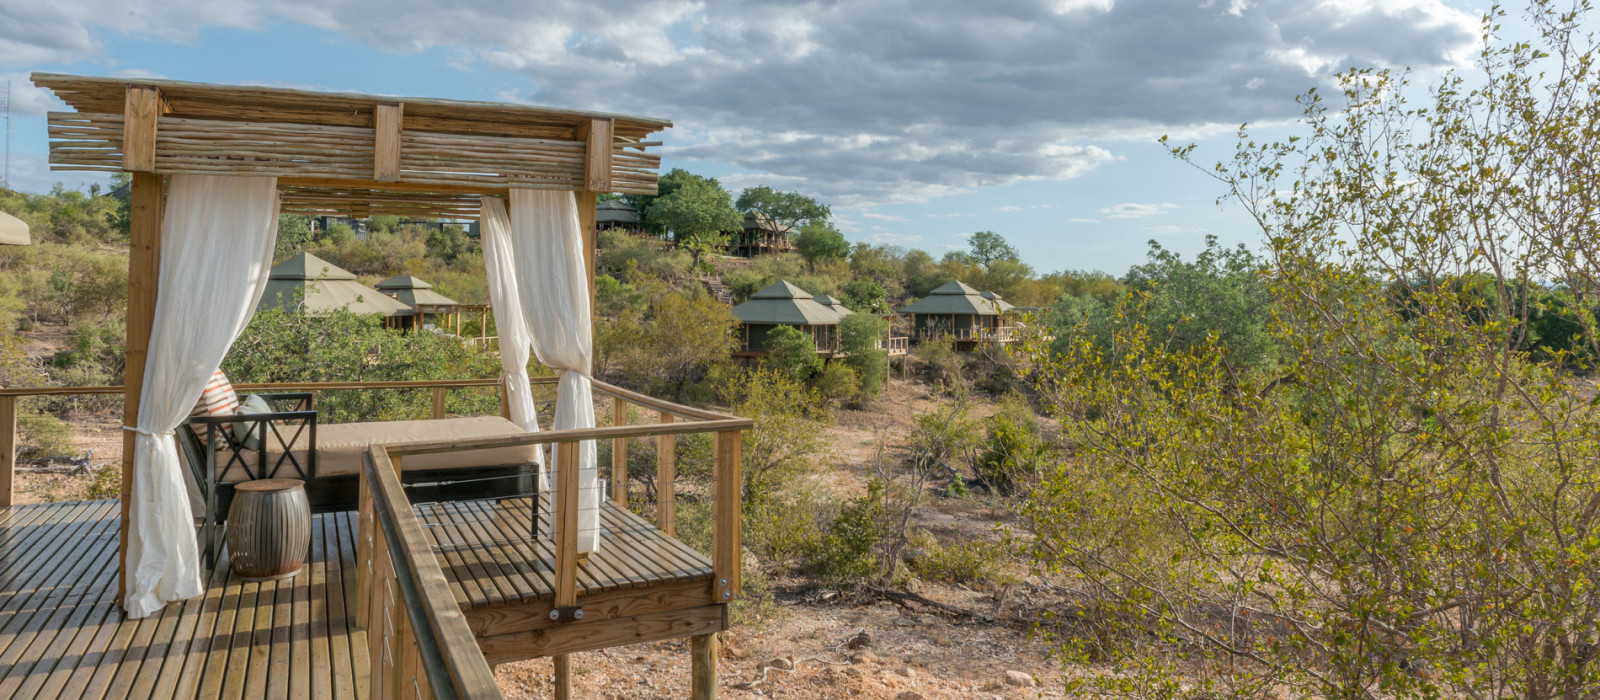 Hotel Simbavati Hilltop Lodge South Africa